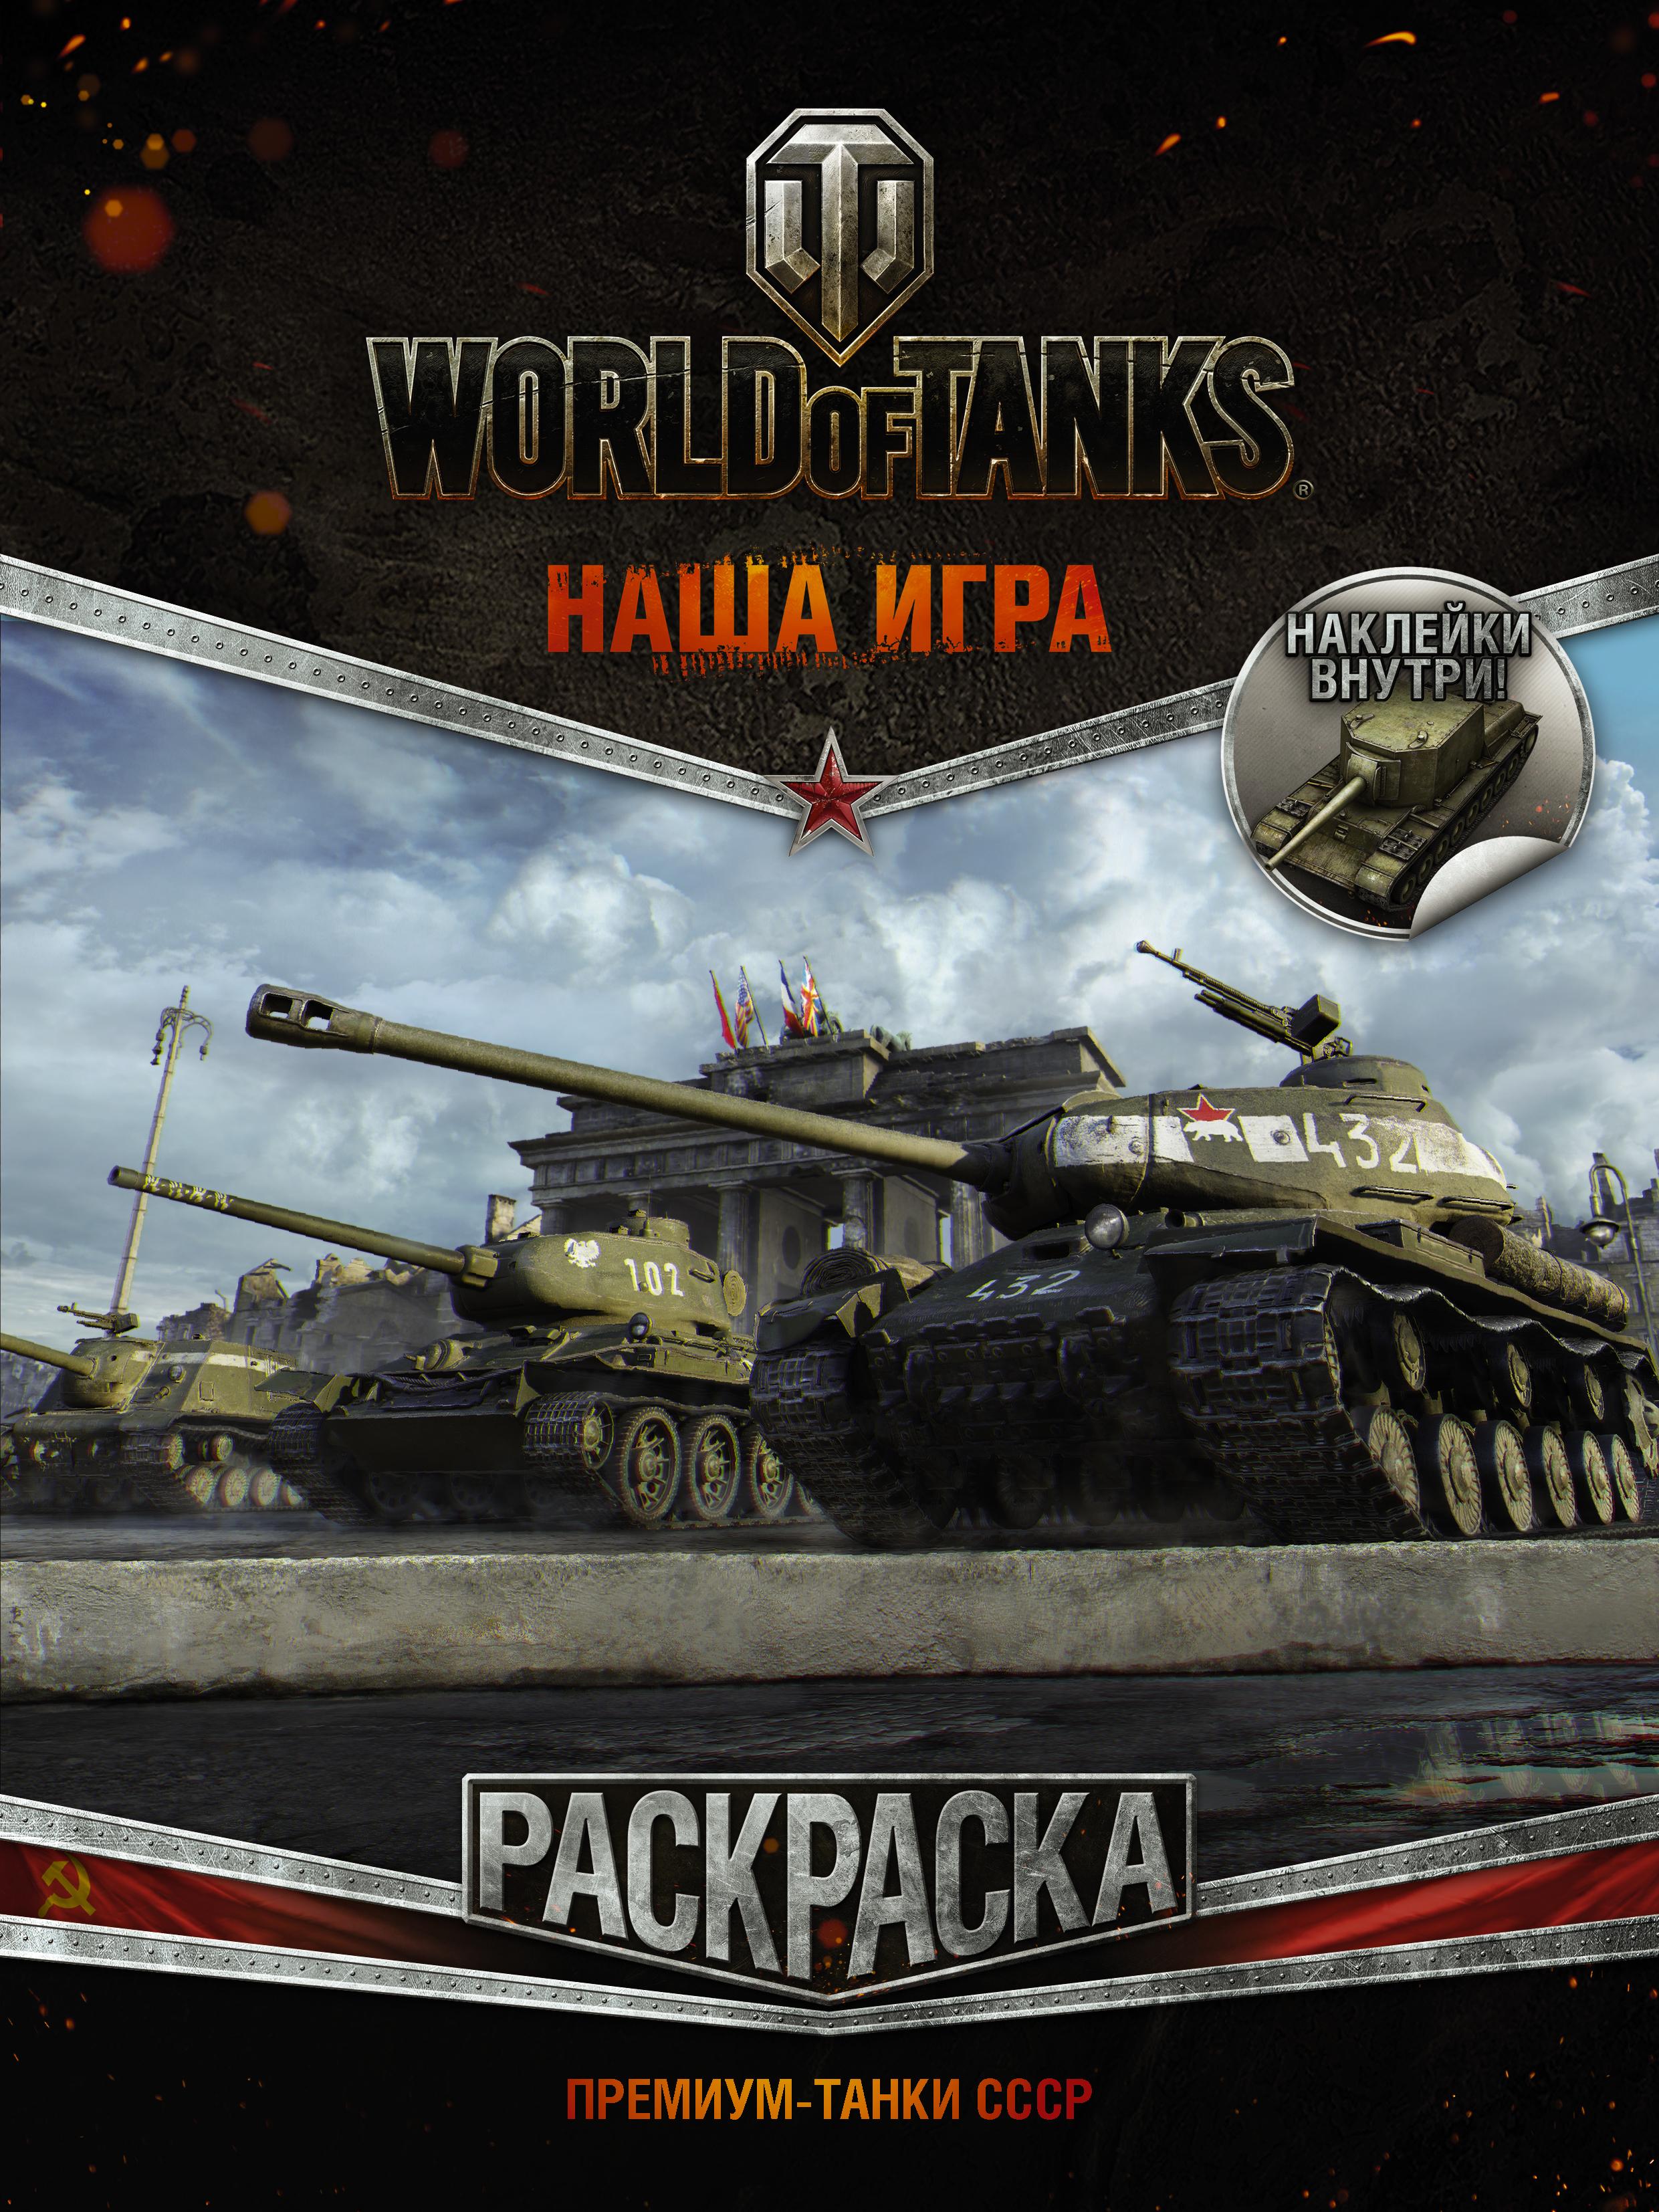 . World of Tanks. Раскраска. Премиум-танки СССР (с наклейками)